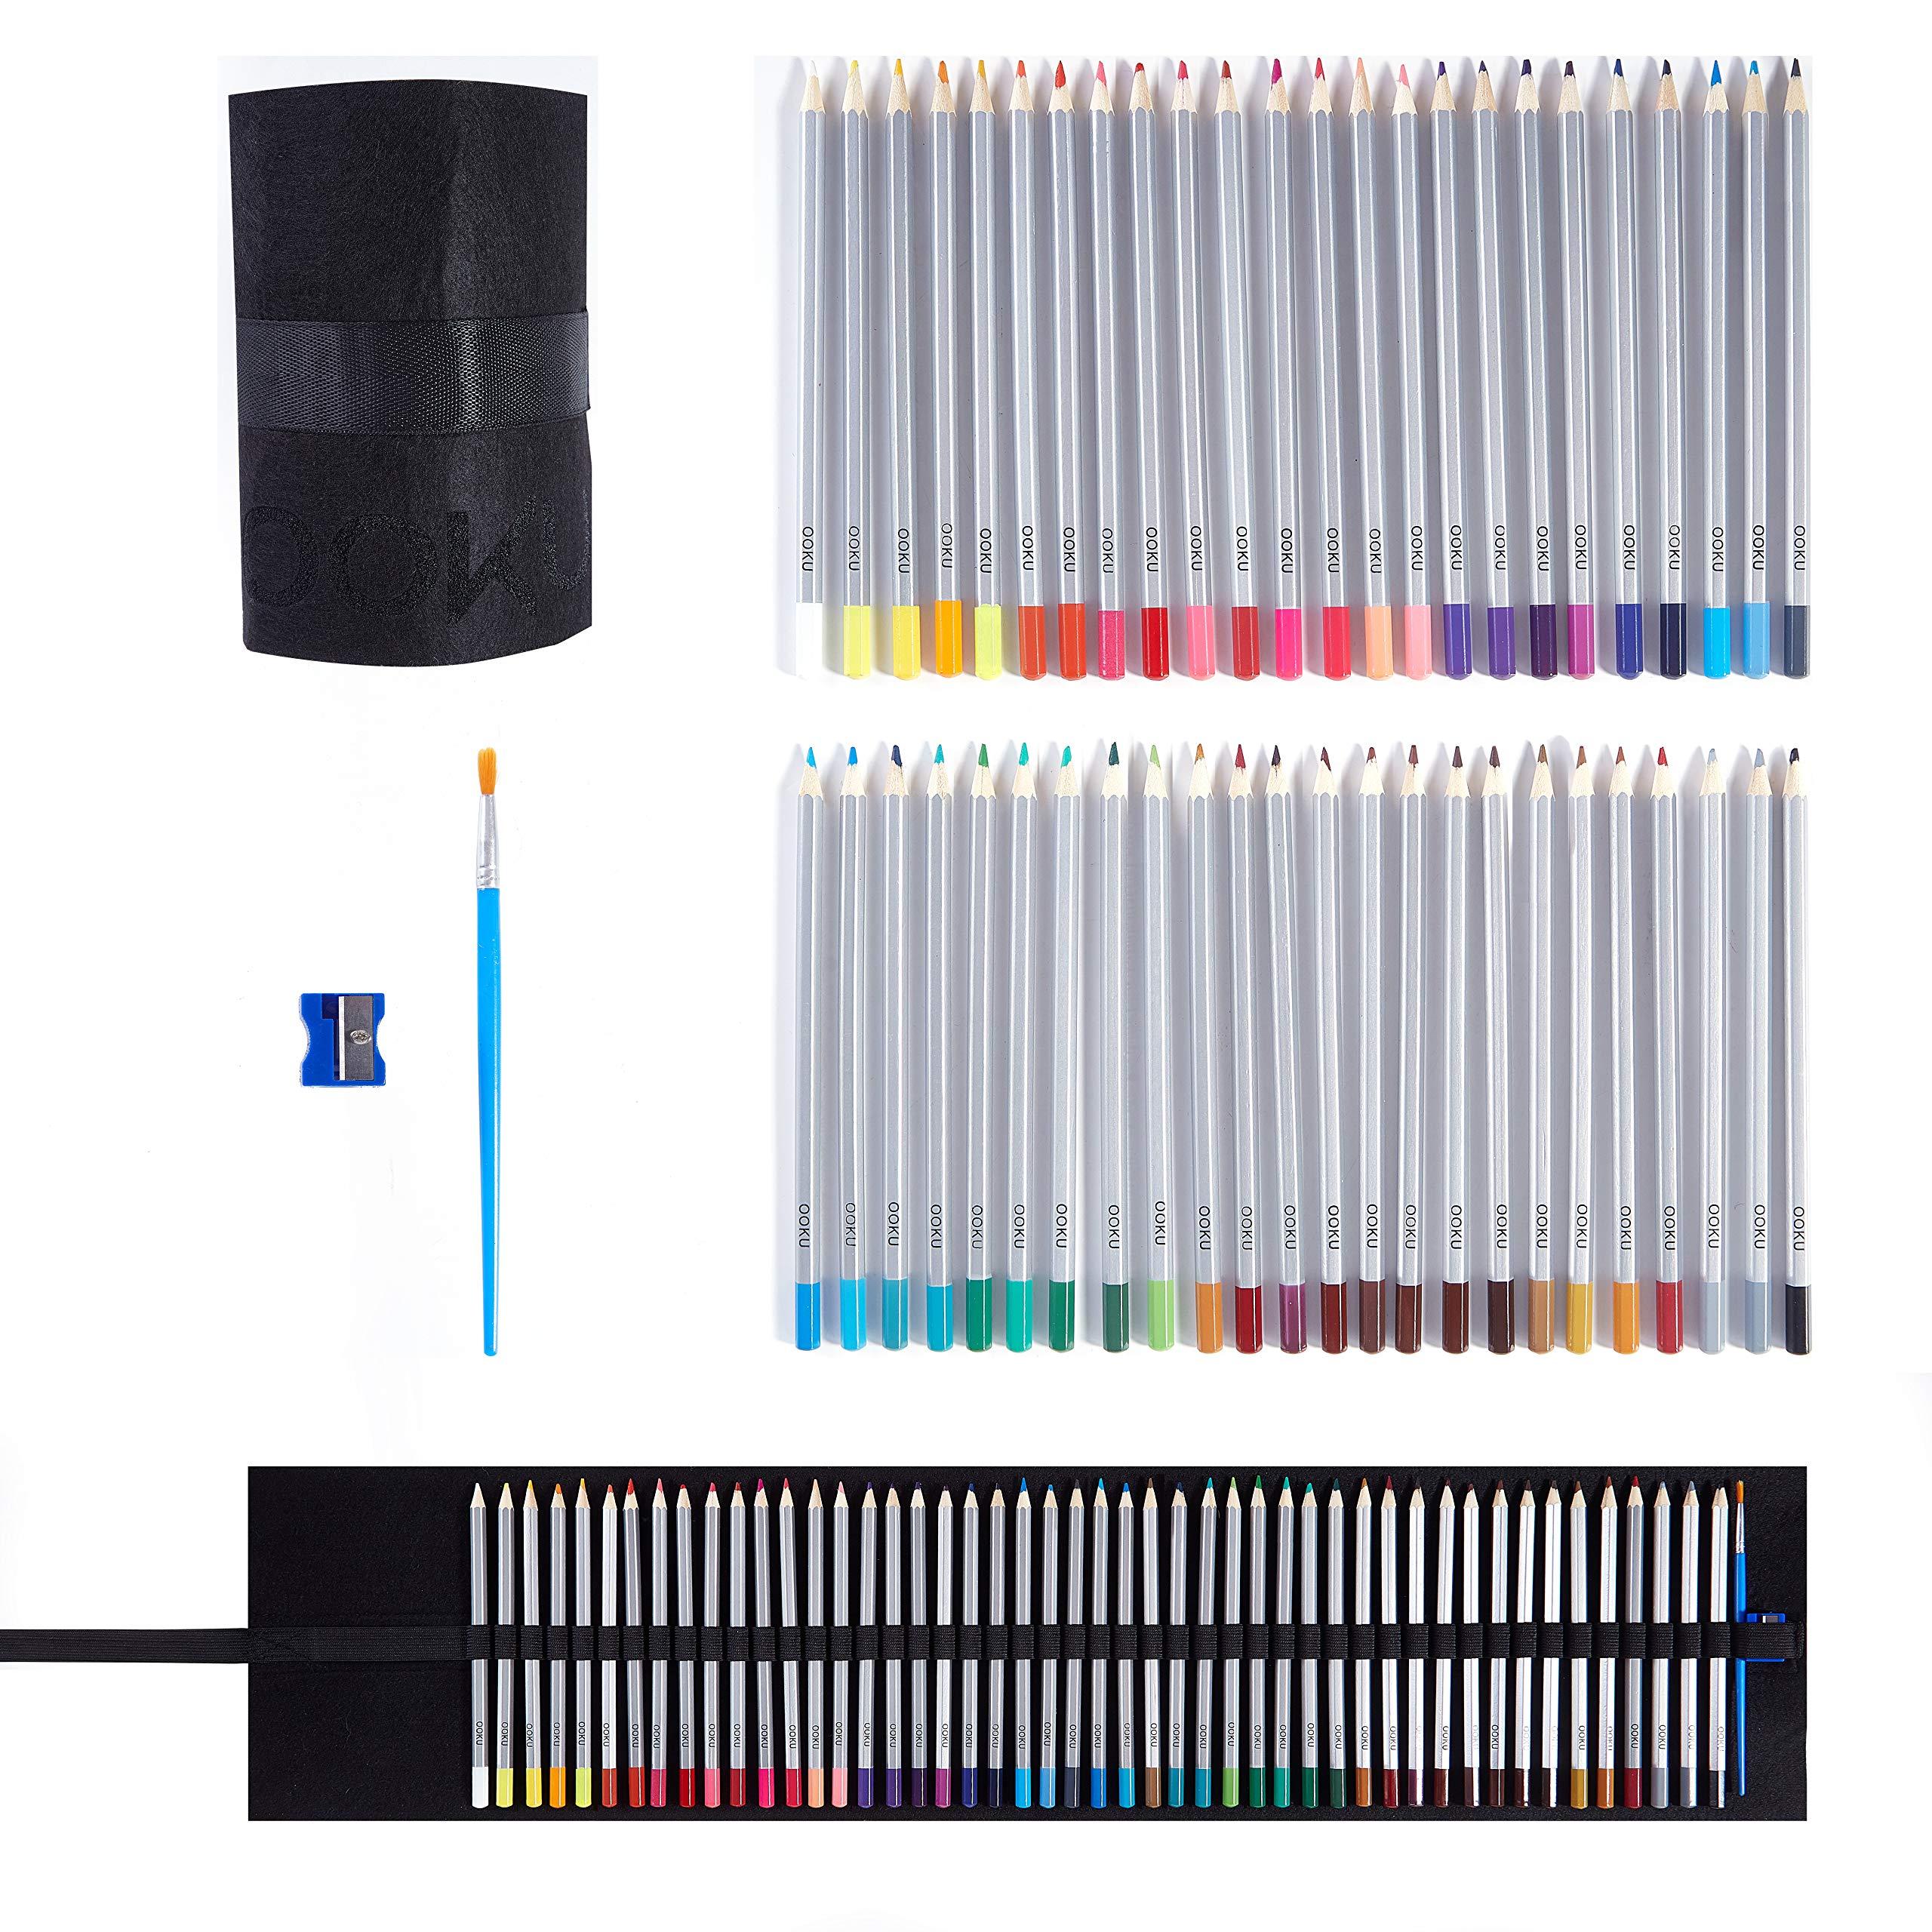 OOKU Watercolor Pencils Artist Set - 48 Dry Coloring Pencils/Wet Watercolor Painting - BONUS Wool Pencil Canvas Wrap, Watercolor Brush, Pencil Sharpener for FULL 51 Piece Kit by OOKU